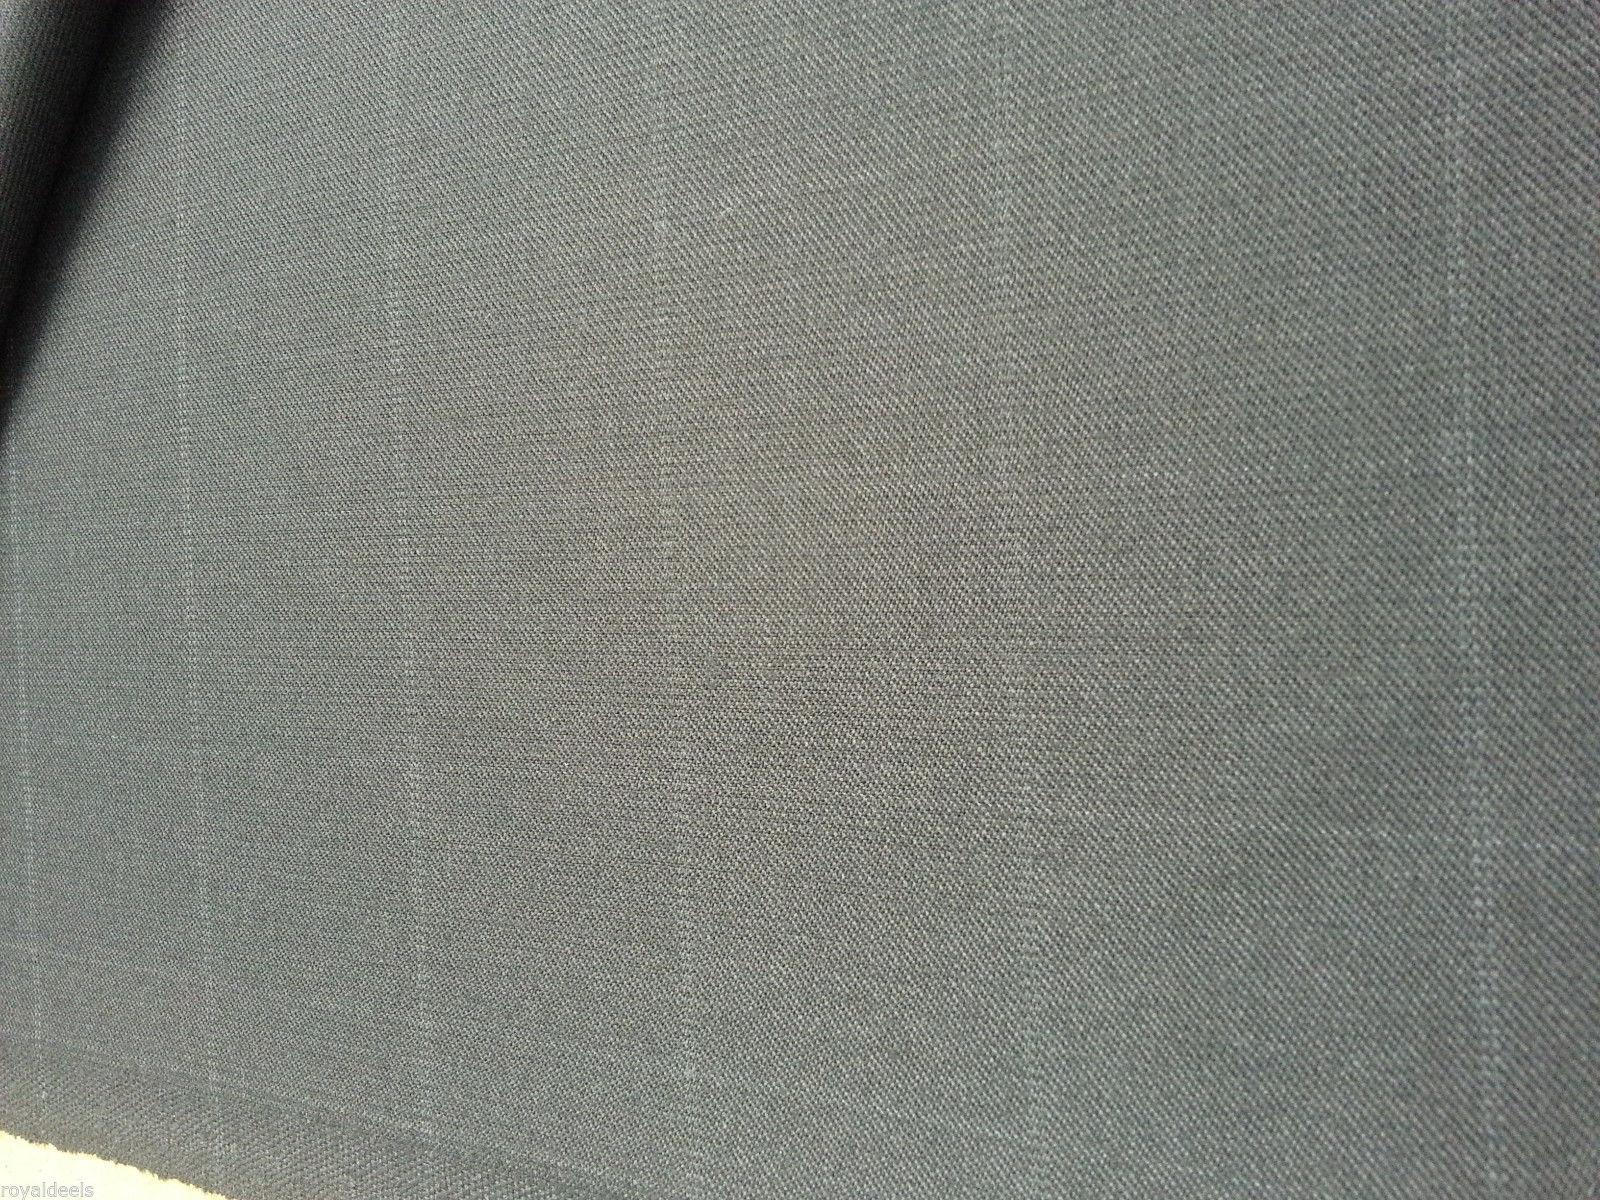 Super 130S fine italian wool Suit fabric  8.2 Yard  msrp 1495